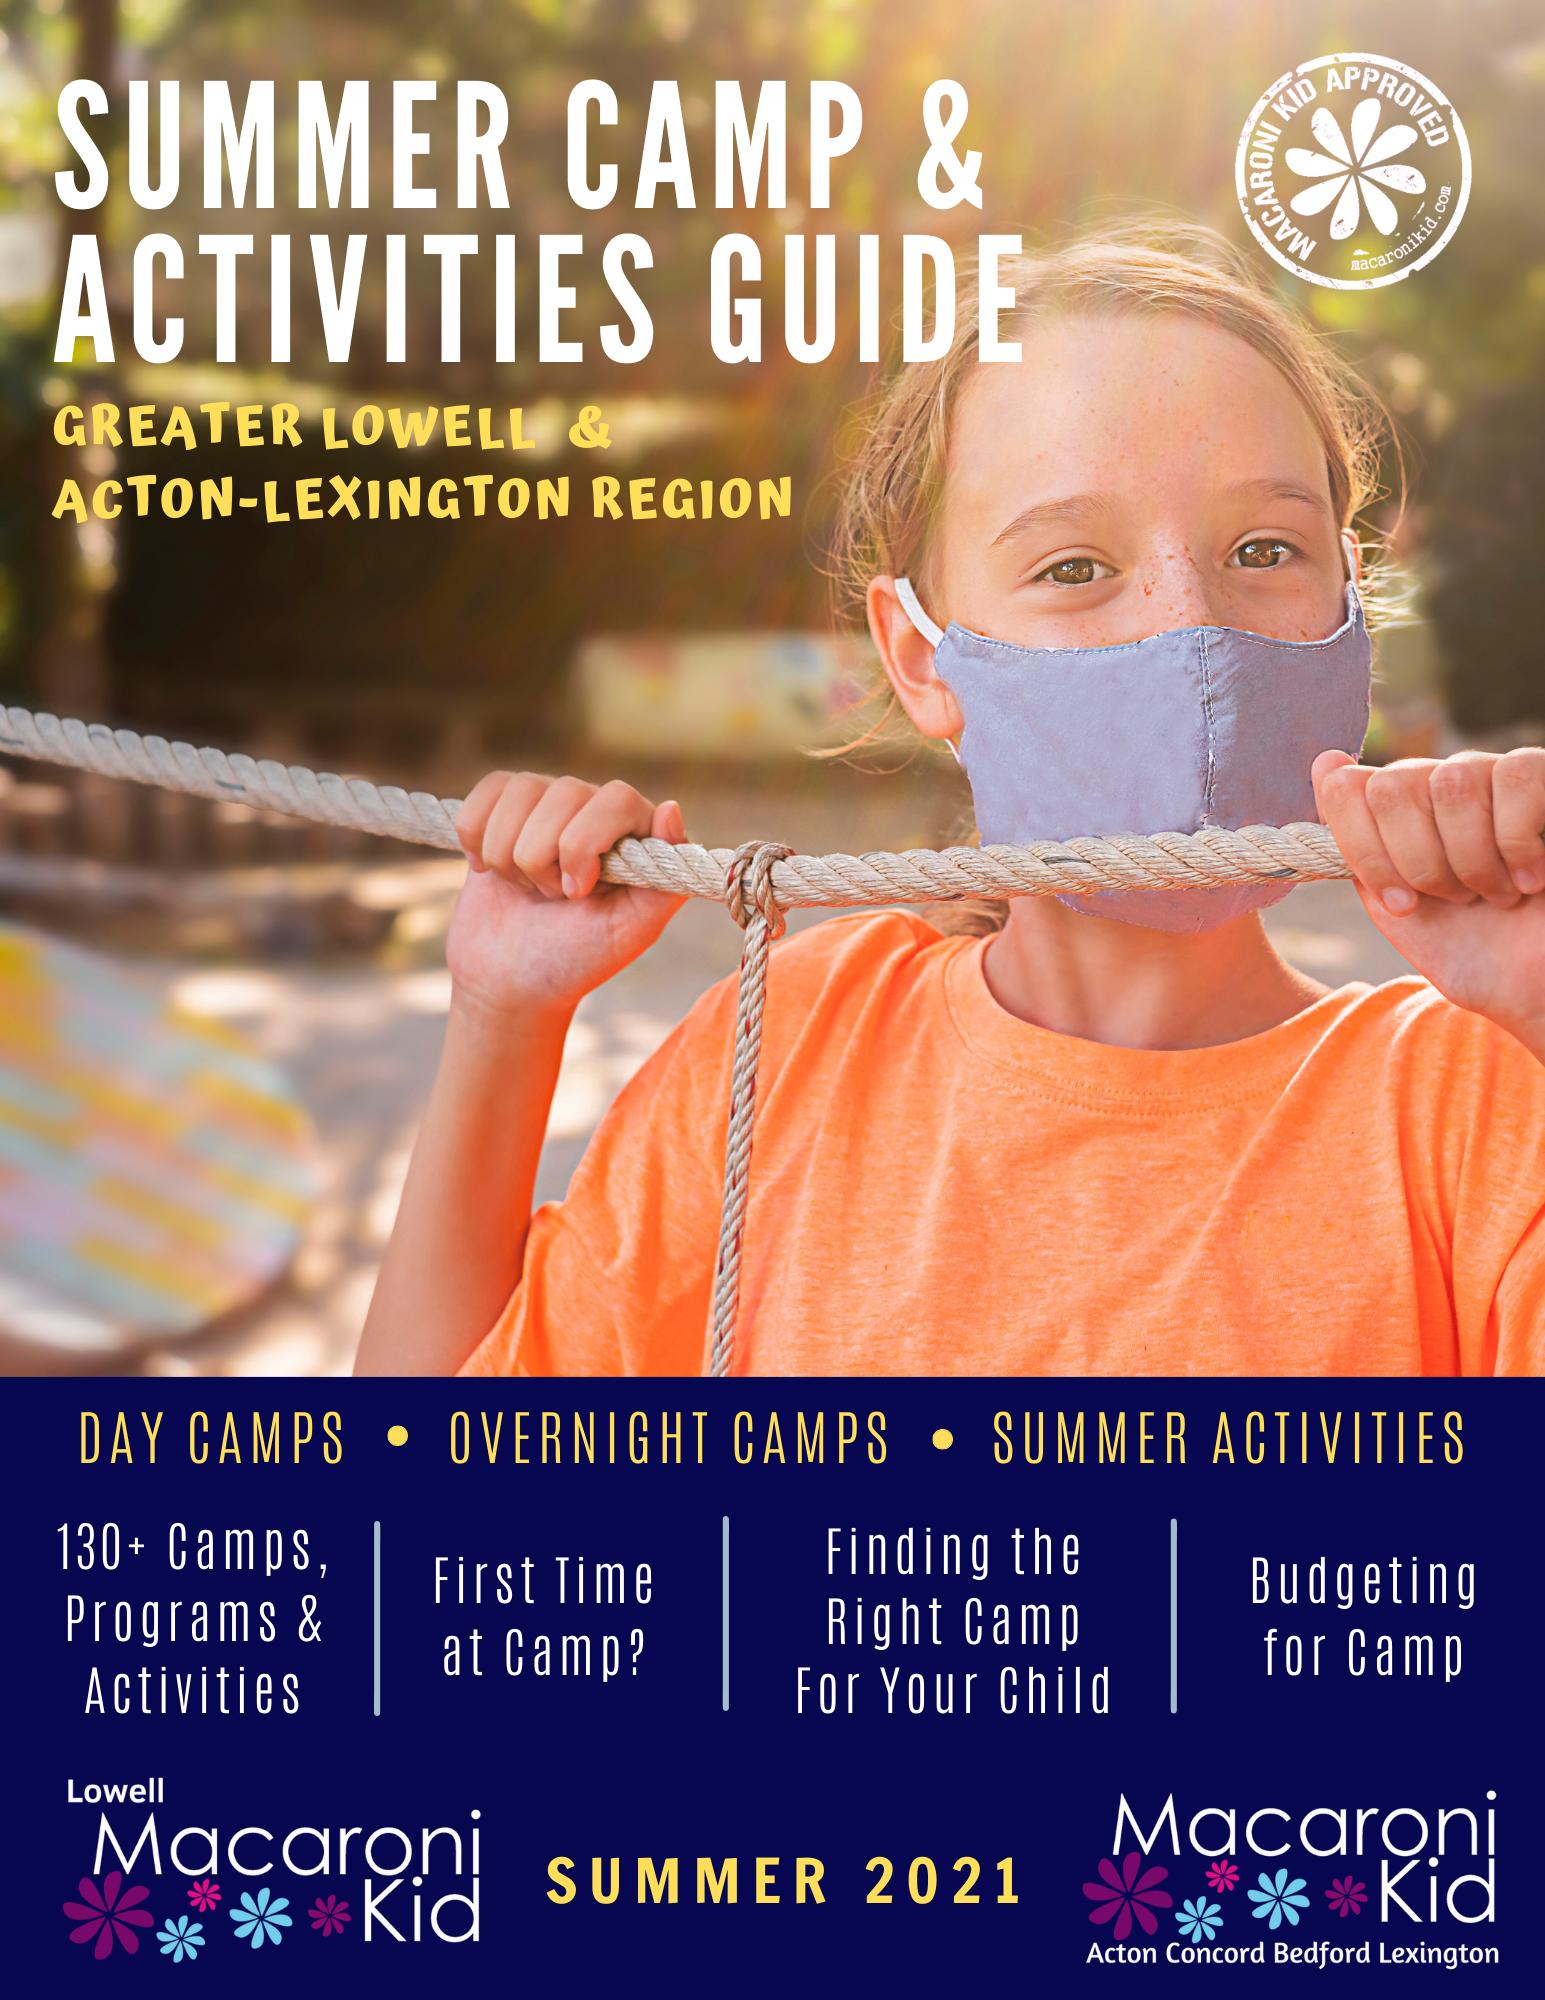 2021 Summer Camp Kids Activities Guide Macaroni Kid Lowell